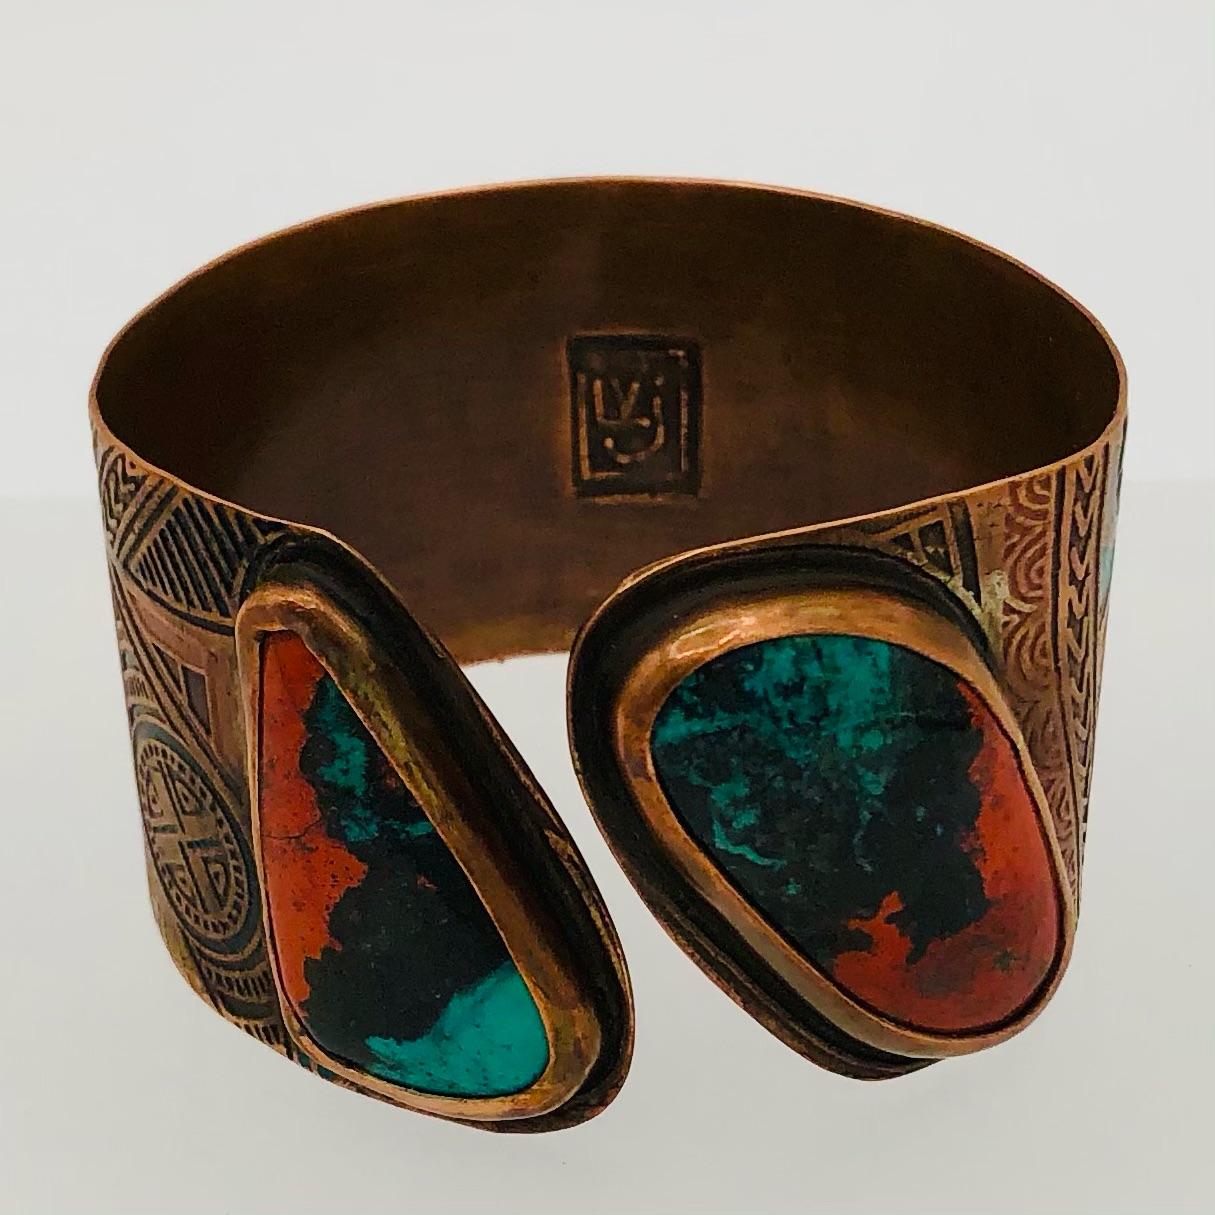 SEDONA SUNRISE - cuff. Hand-etched copper, Sedona Sunrise cabochons  175-